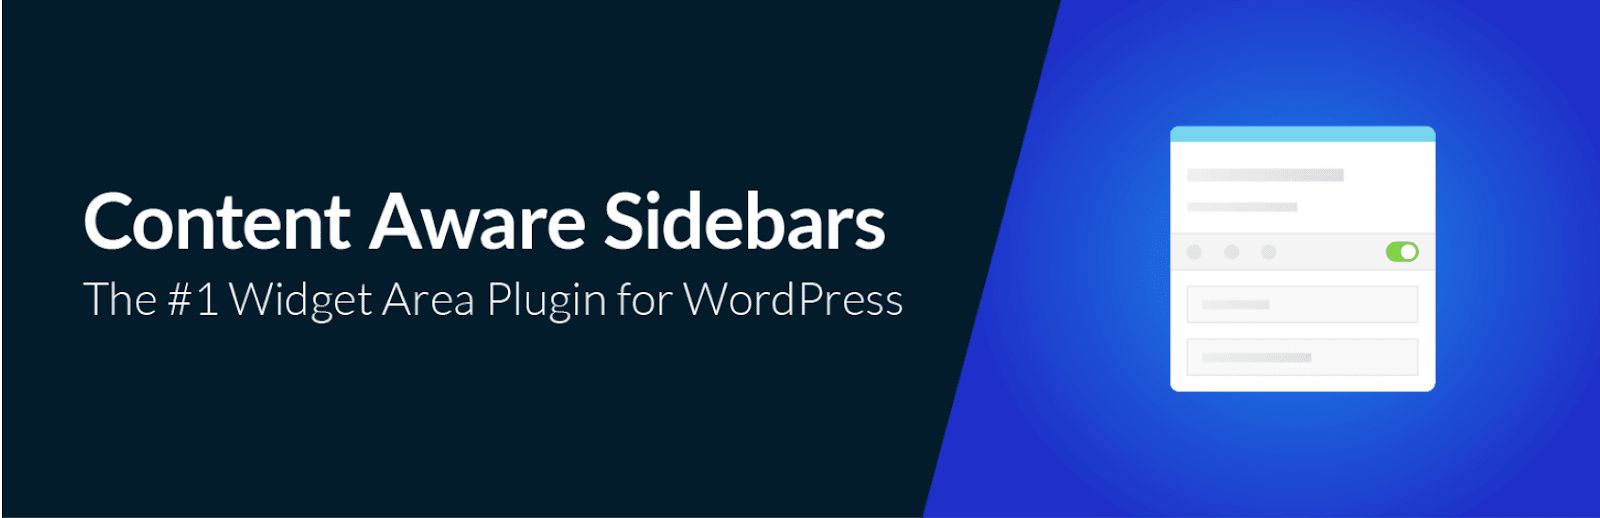 Content Aware Sidebars WordPressplugin